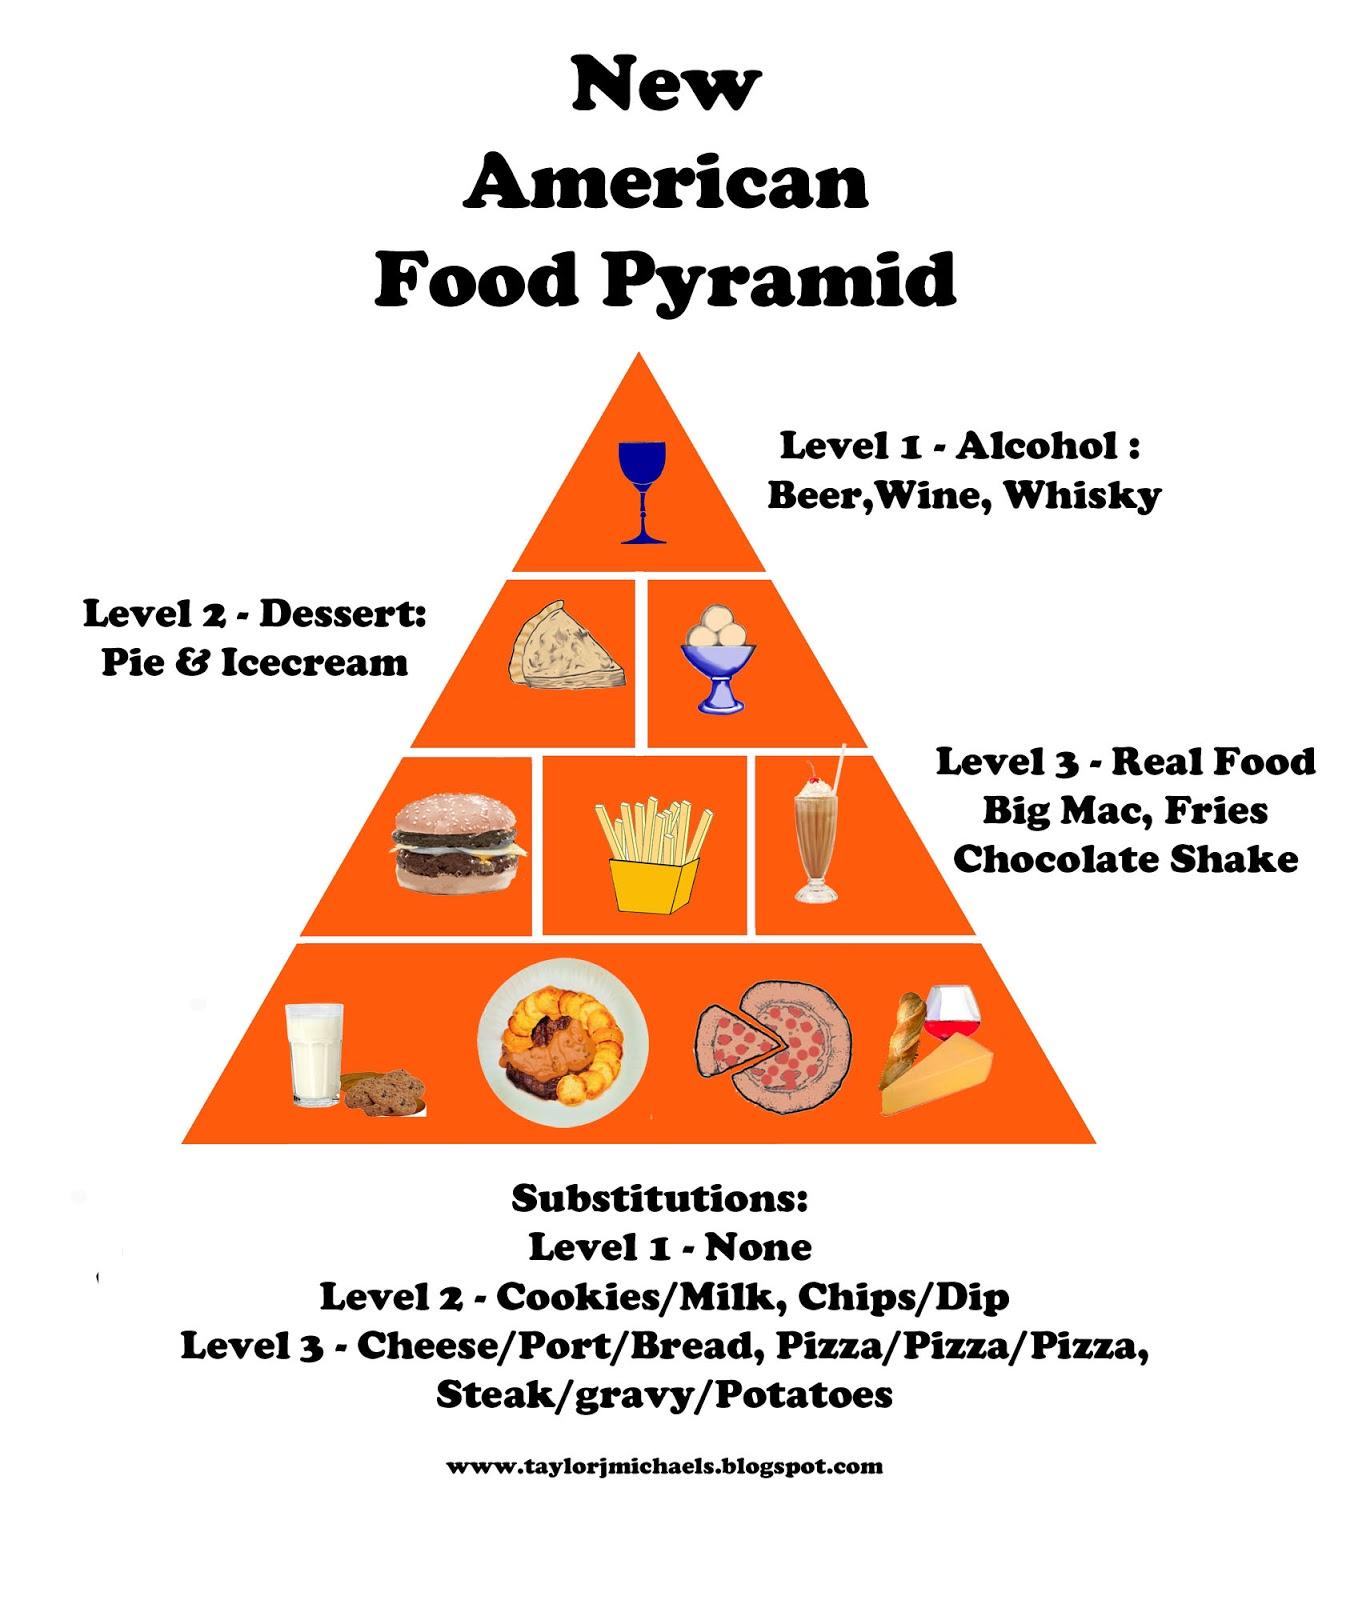 American Food Pyramid | www.pixshark.com - Images ...